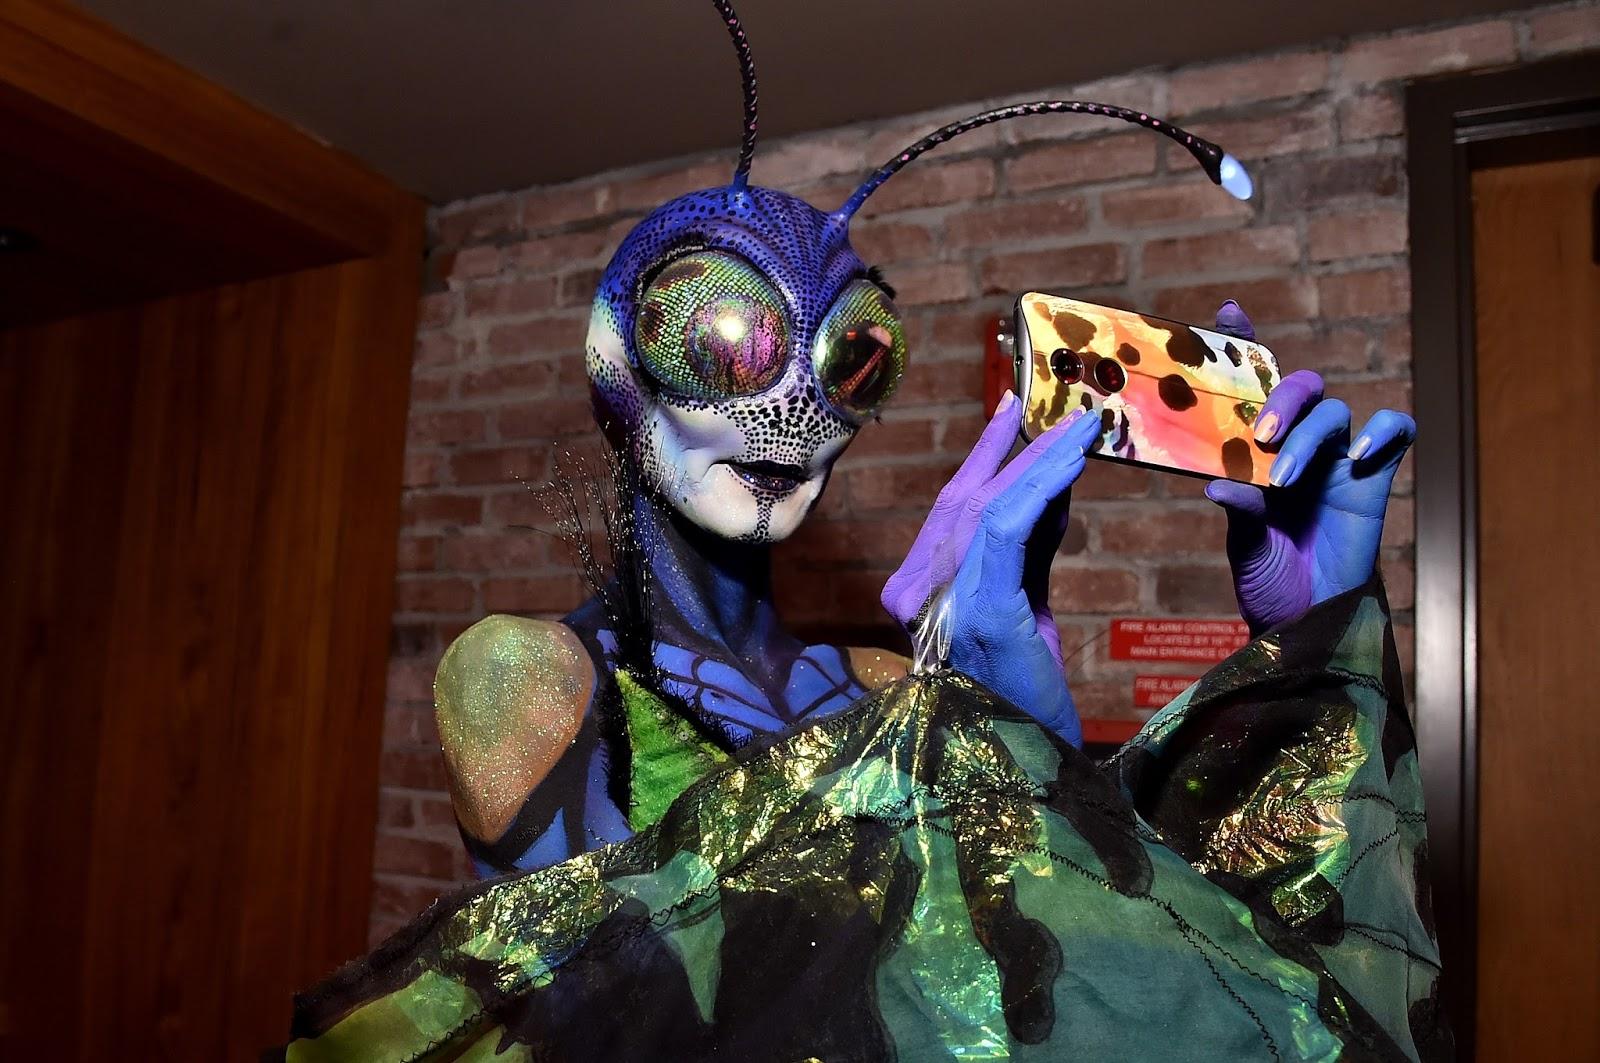 At Heidi Klum's Halloween Party